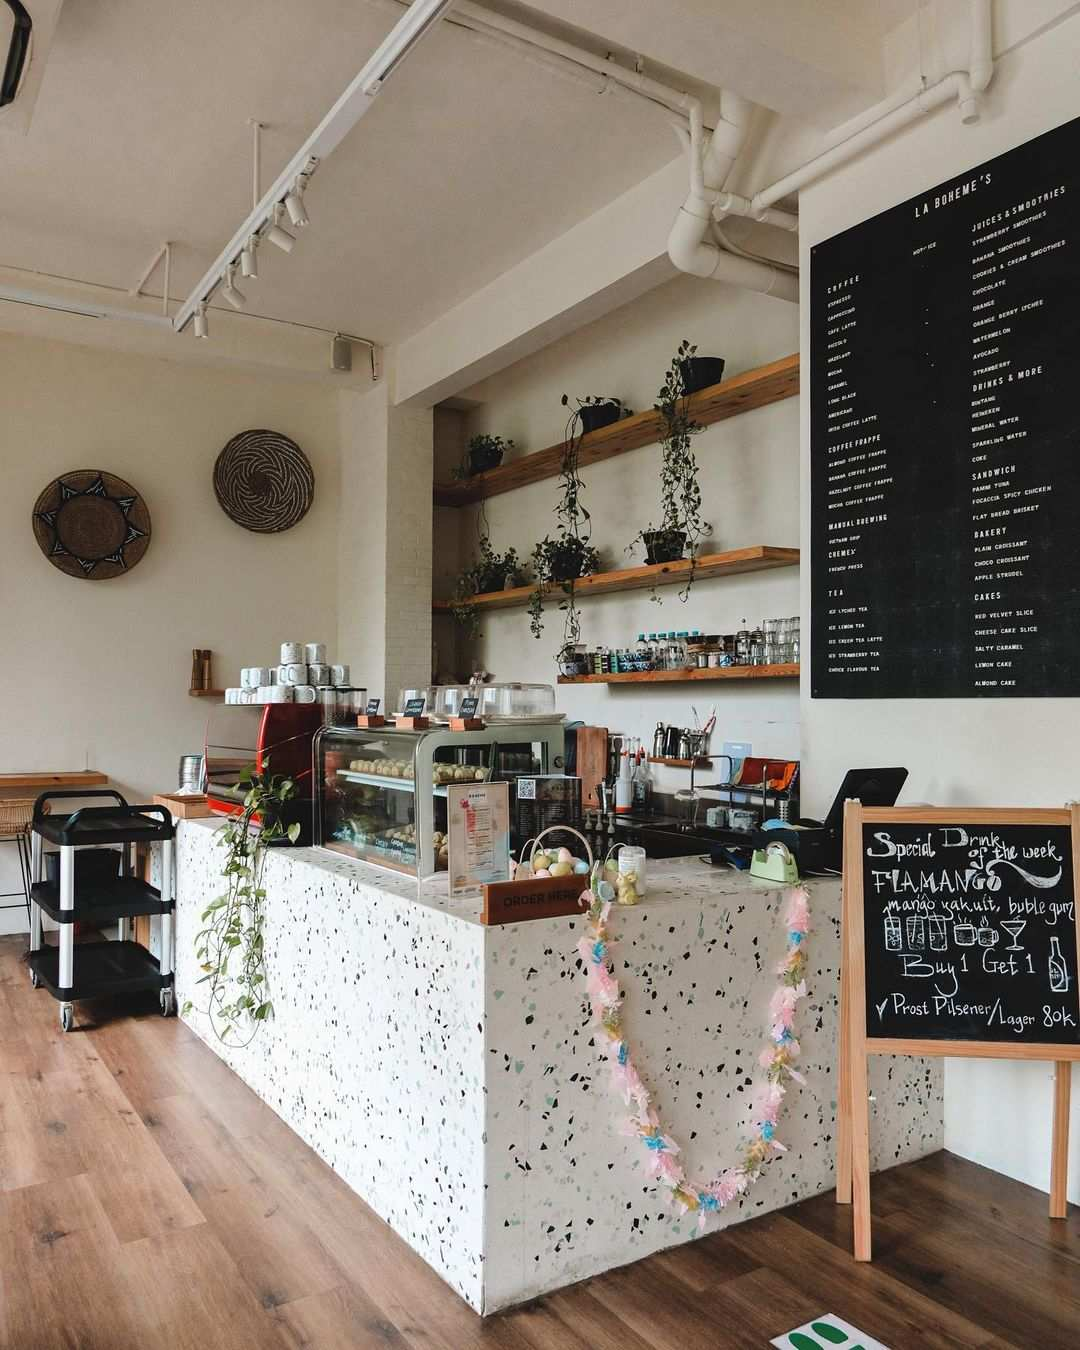 Bagian Dalam La Boheme Cafe Jakarta Image From @nandarasman